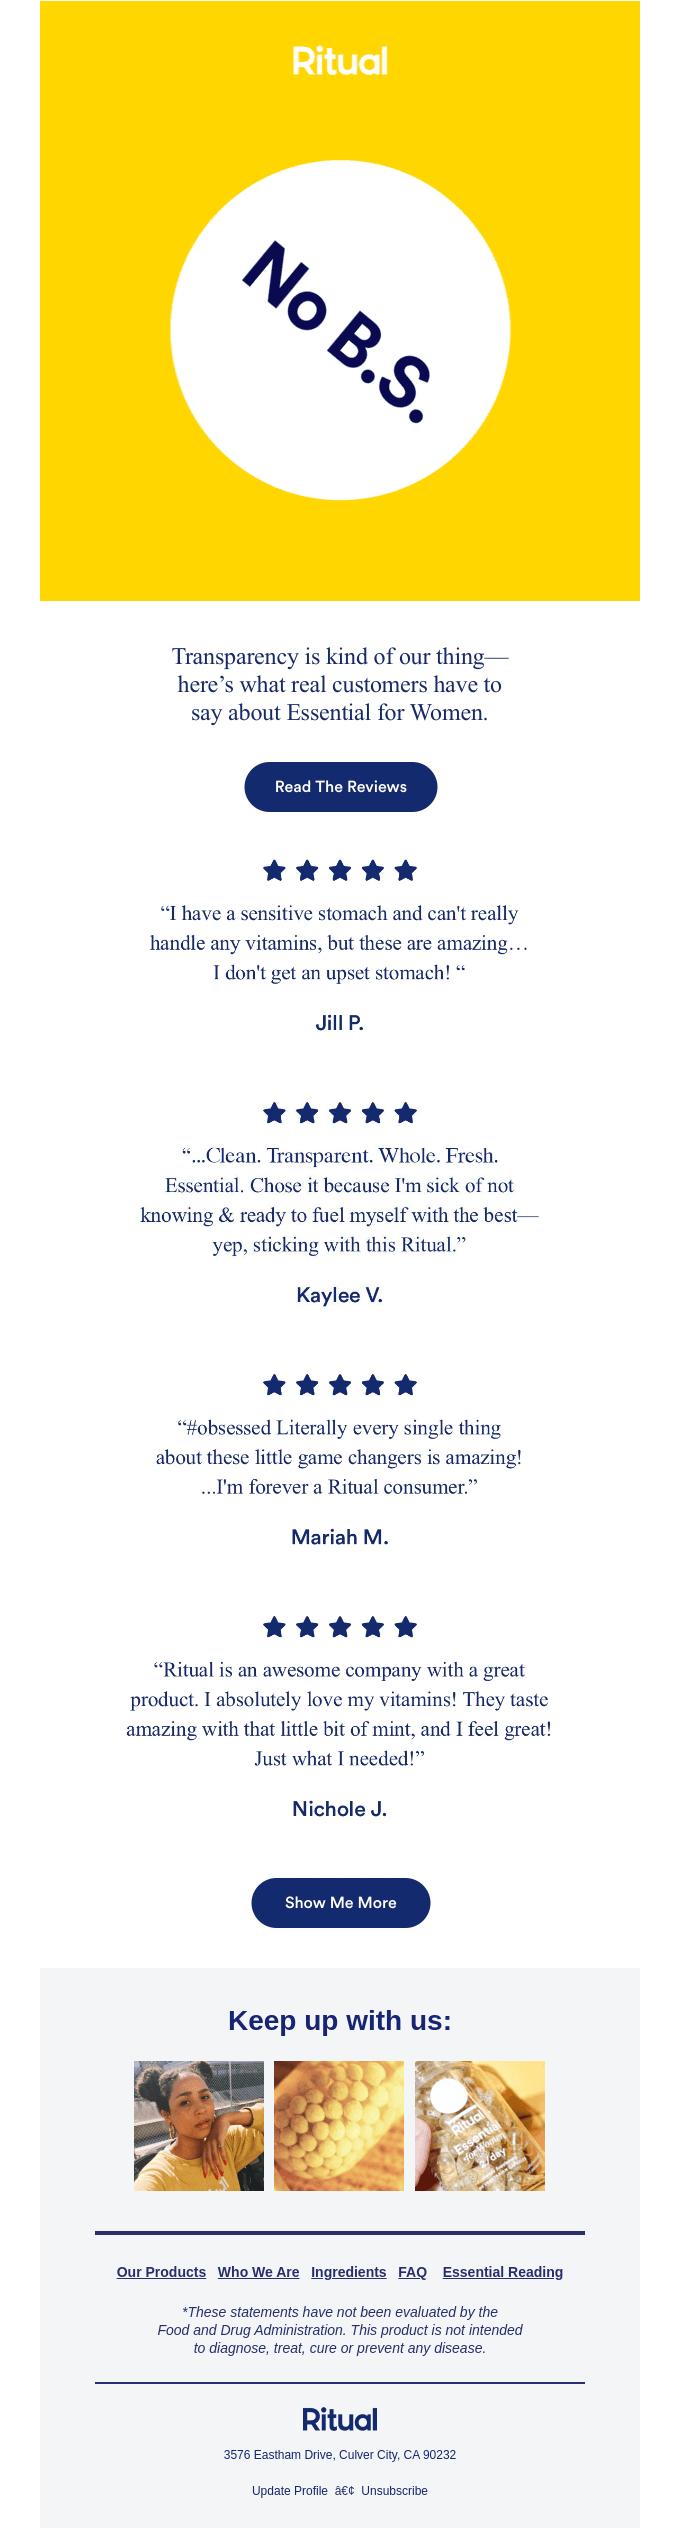 using customer testimonials in email